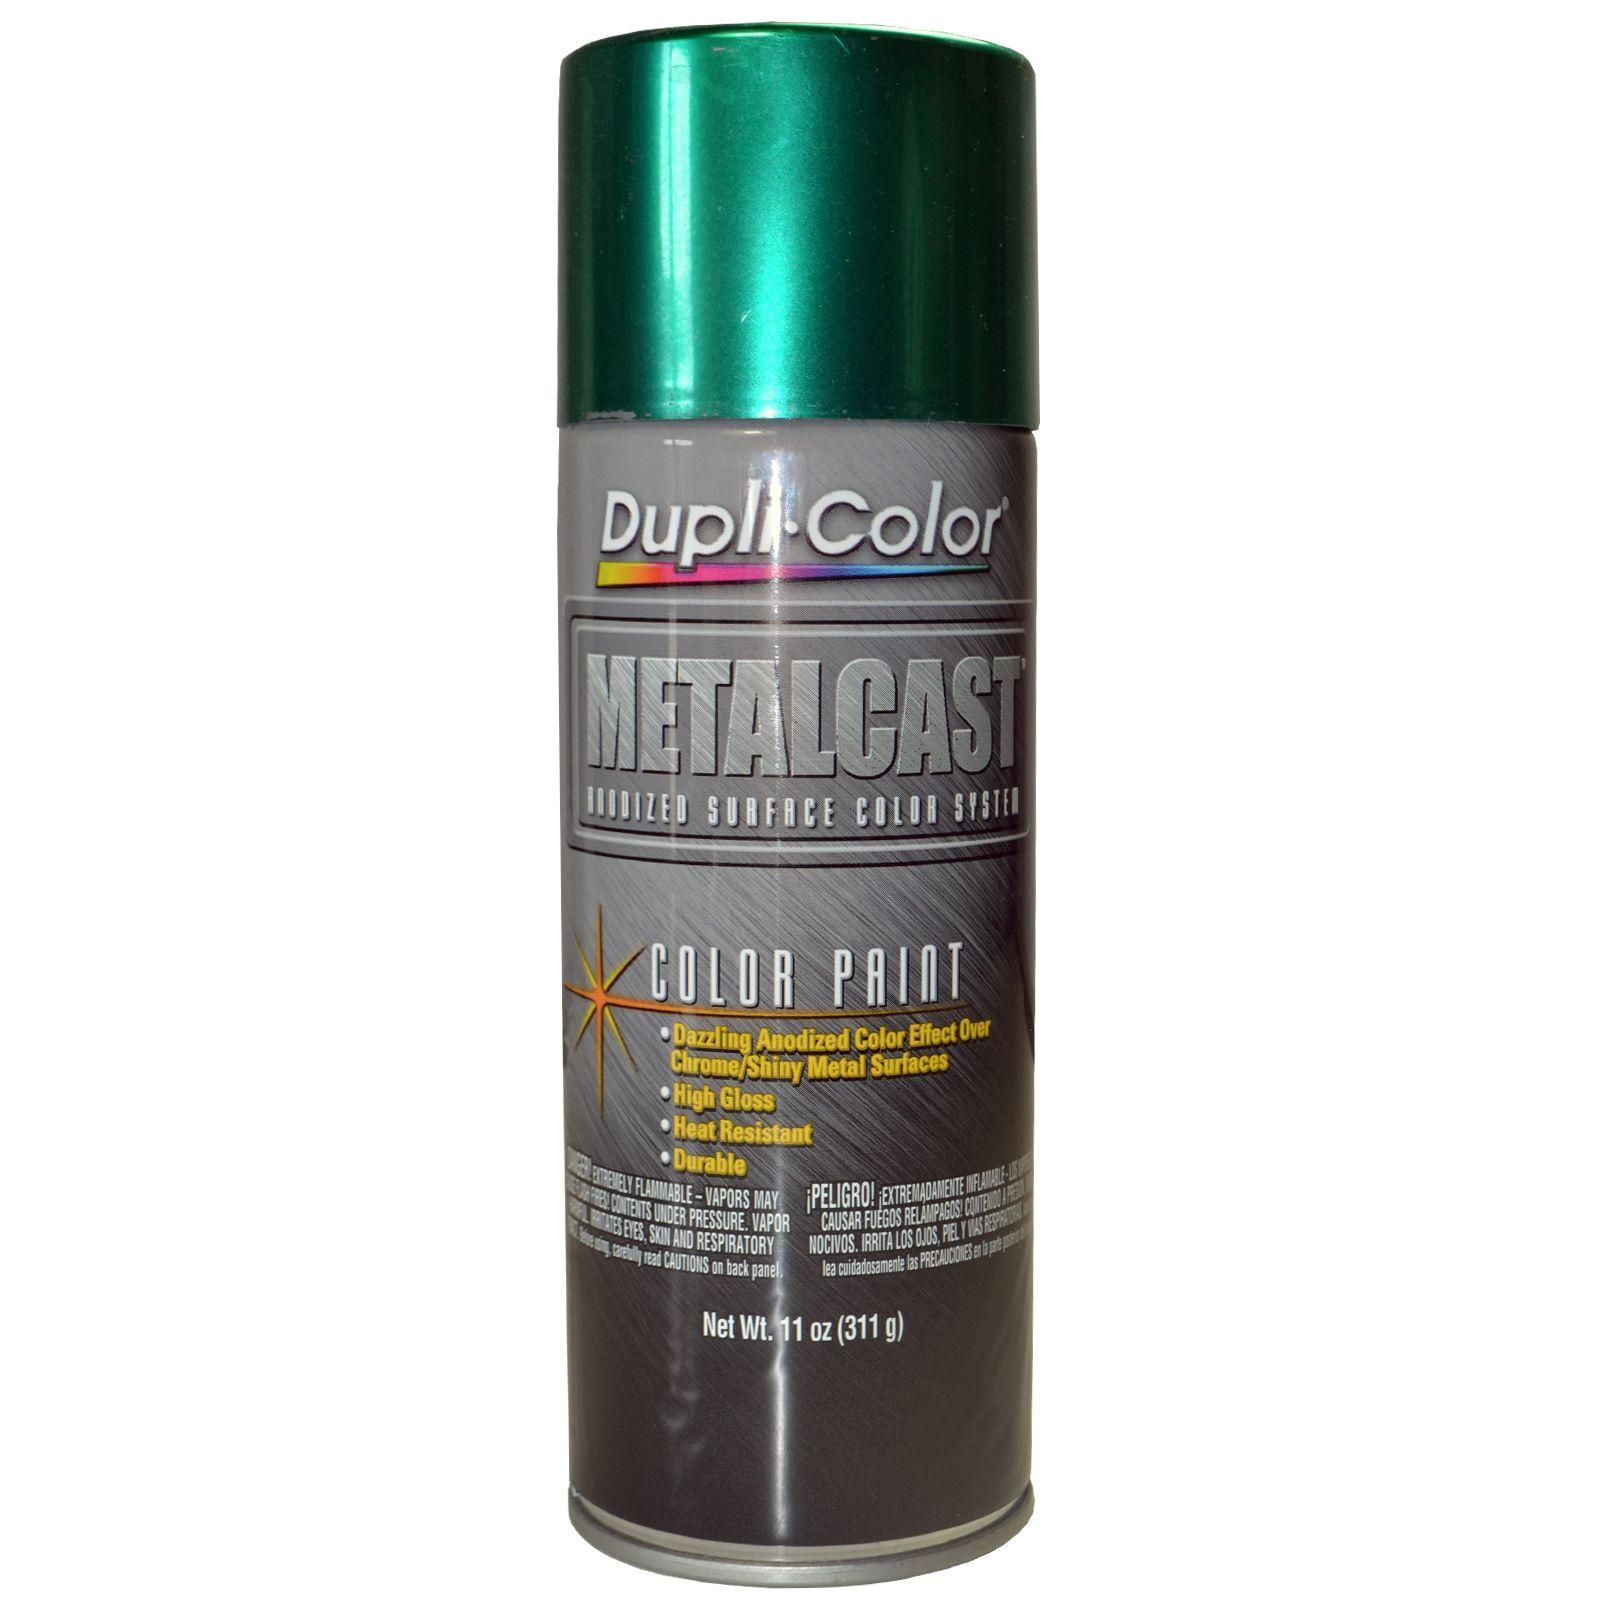 Dupli Color Mc203 Green Metalcast Anodized Spray Aerosol Paint 11 Oz Can Ebay